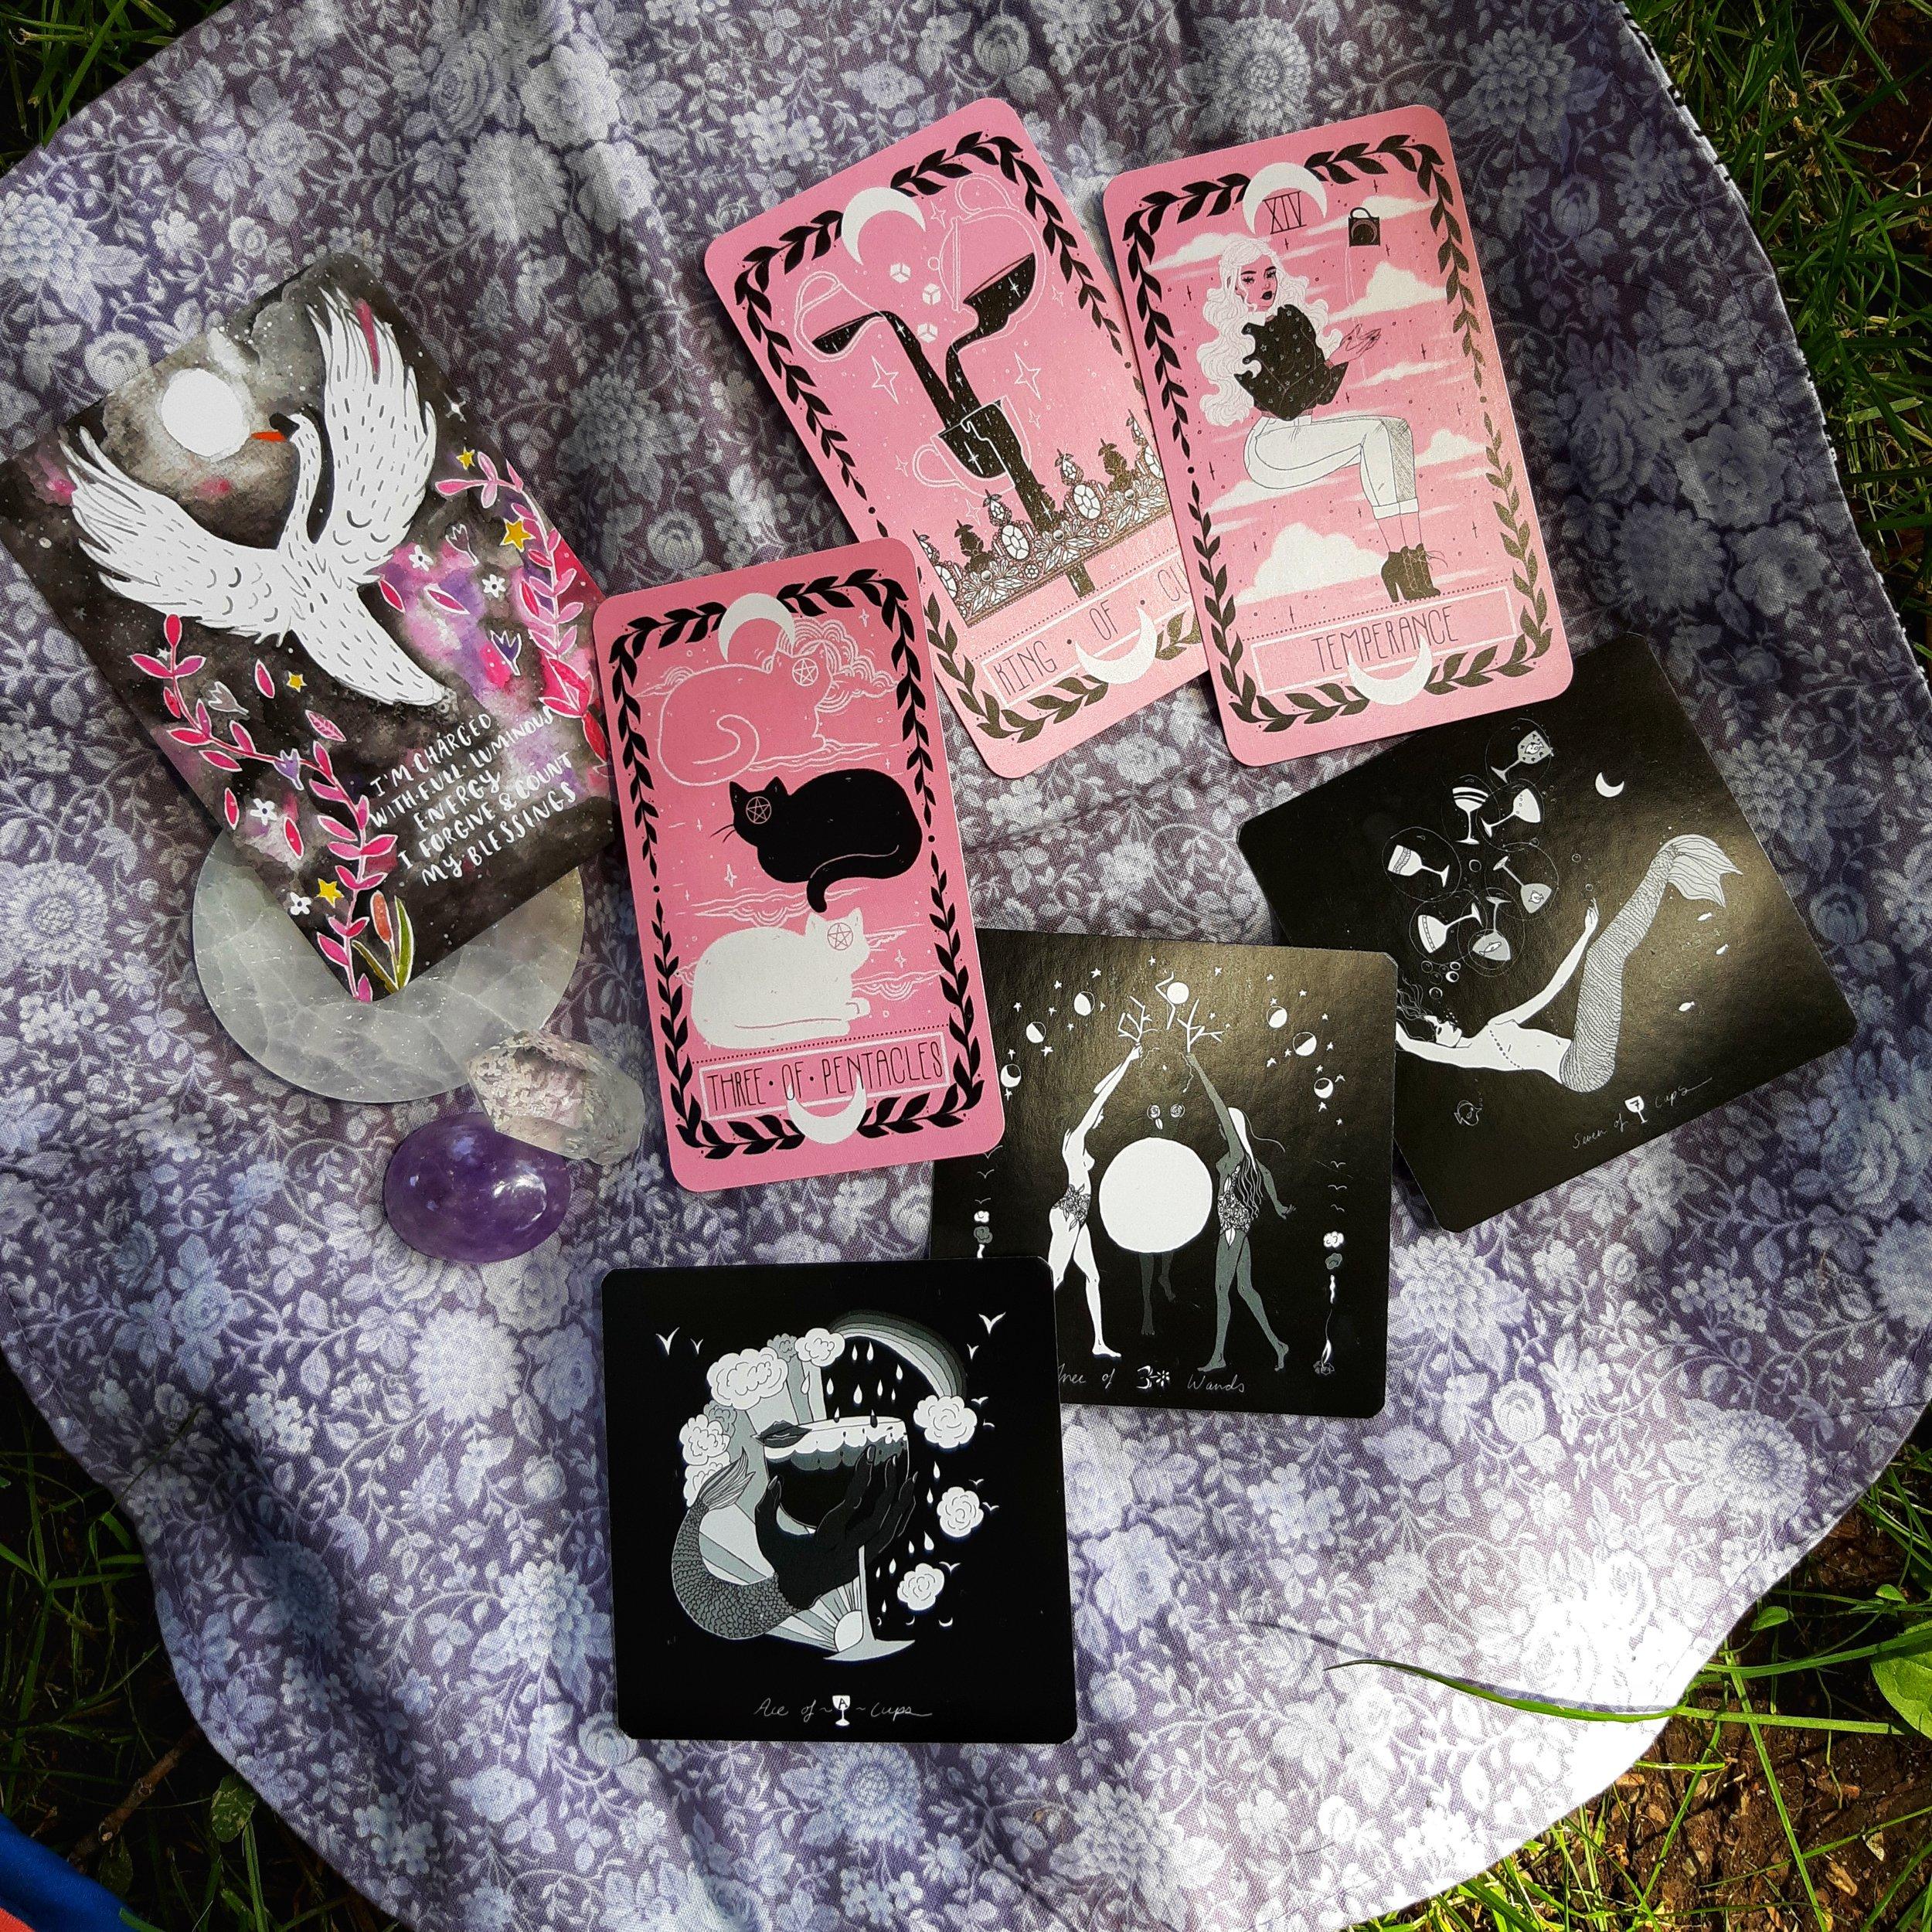 Dark Days Tarot and Lovely Omens Tarot